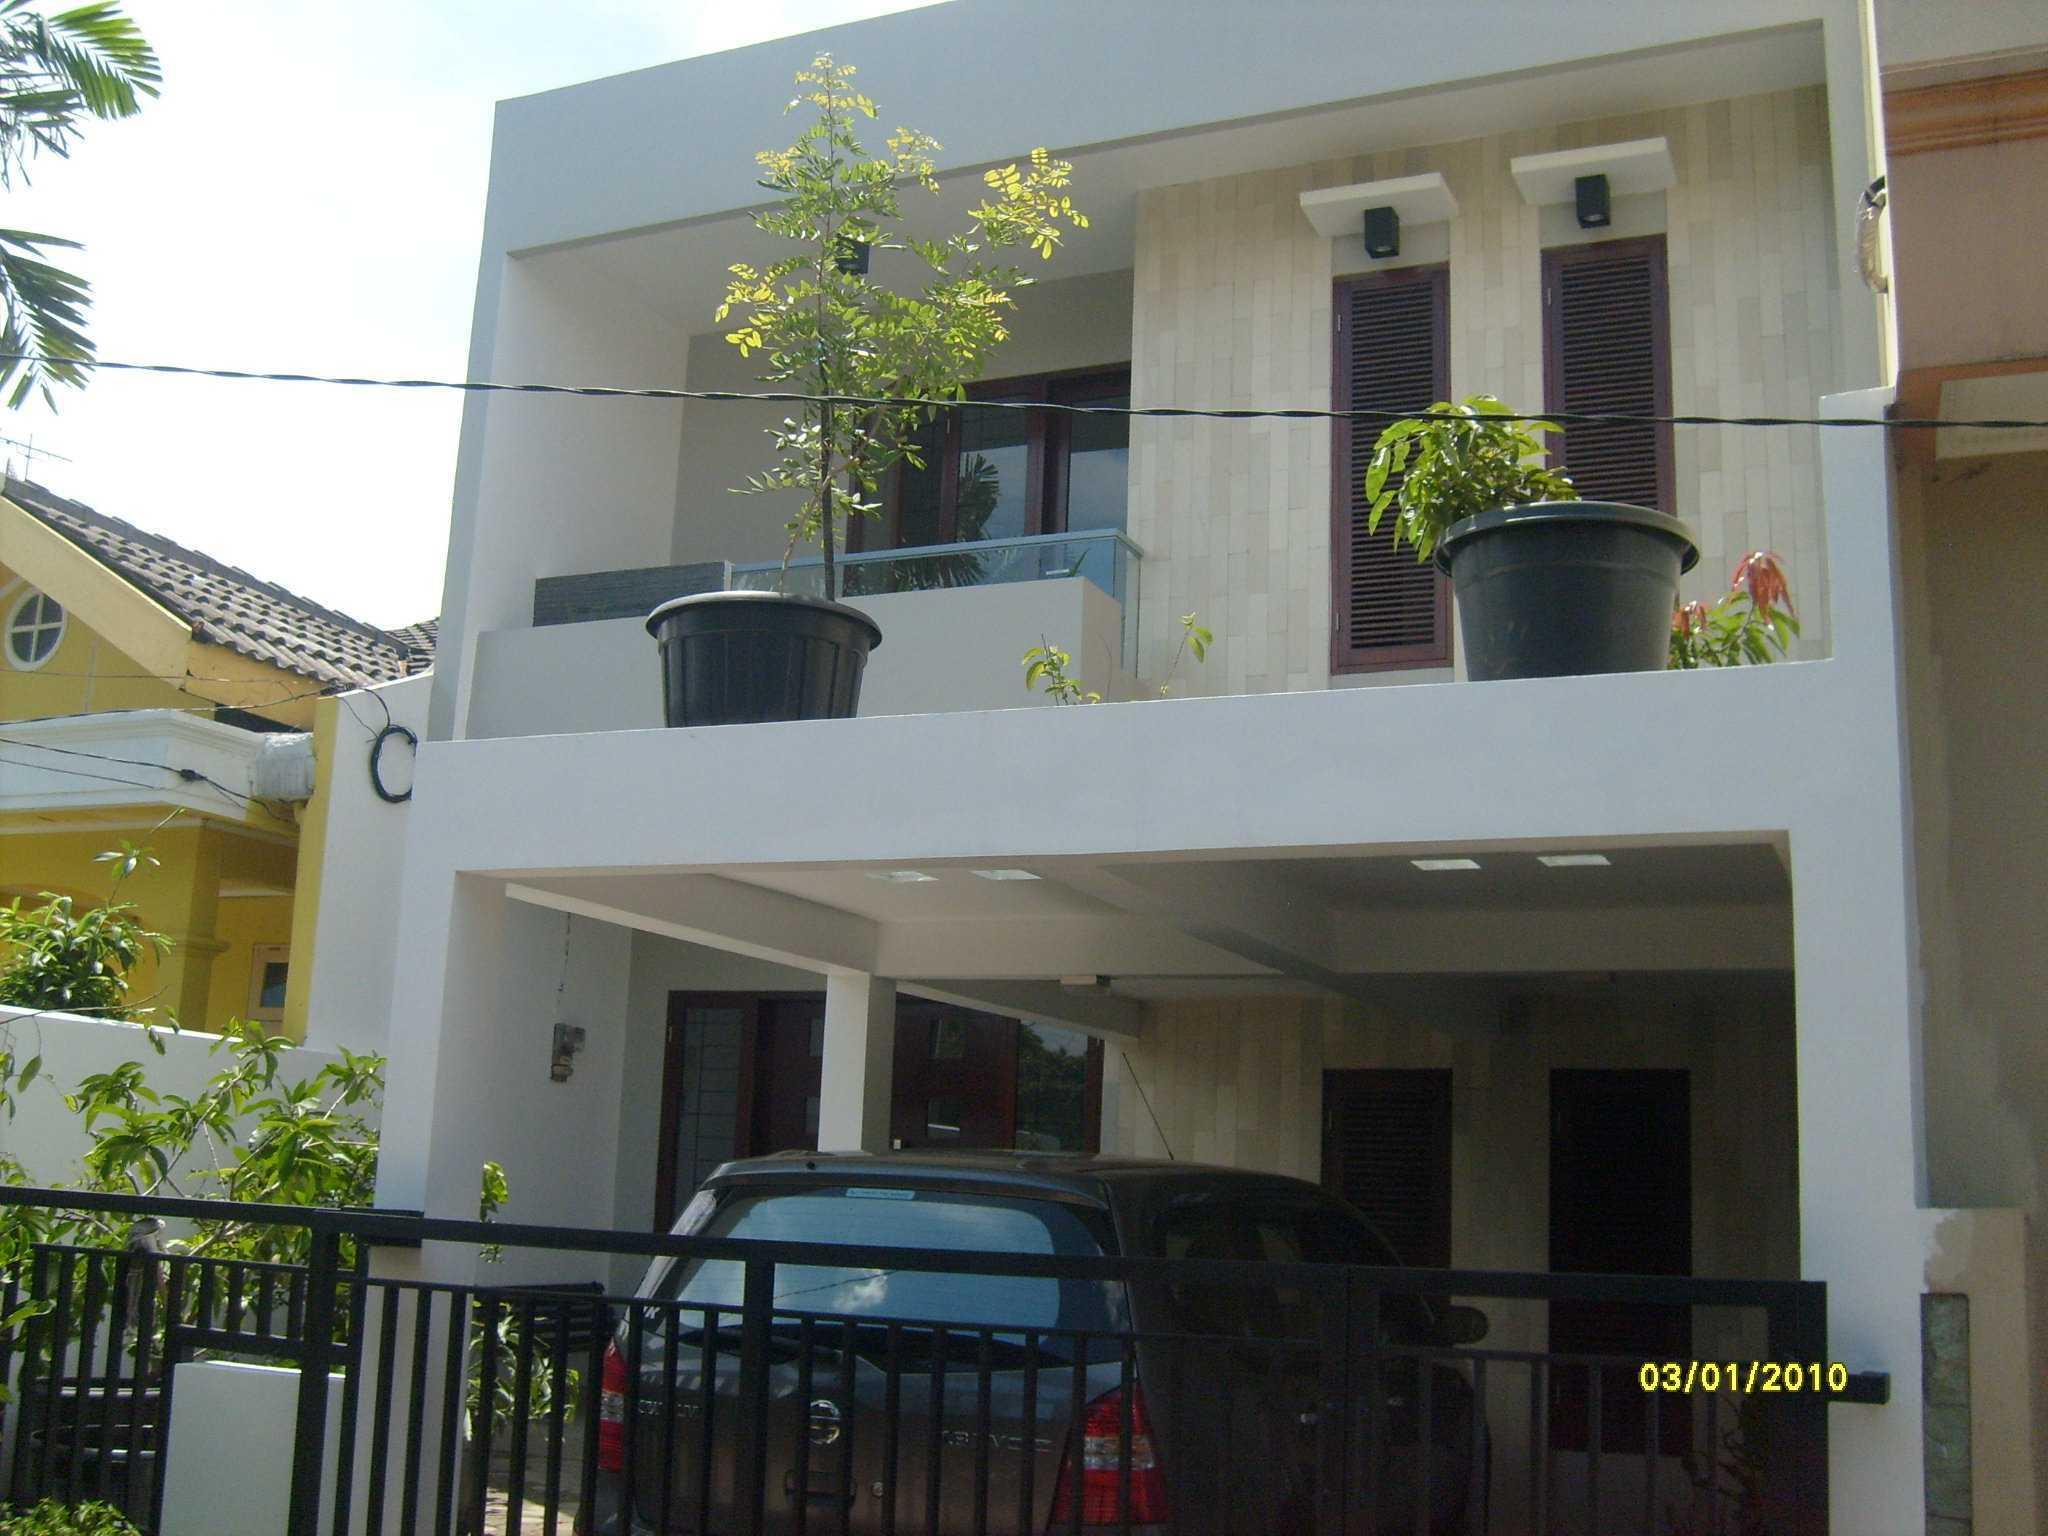 Yunus Noor Capt. Lalu House Jalan Raya Pondok Gede, Jatiwaringin, Pondokgede, Jatiwaringin, Pondokgede, Kota Bks, Jawa Barat 17411, Indonesia  Yunus-Noor-Capt-Lalu-House  55248